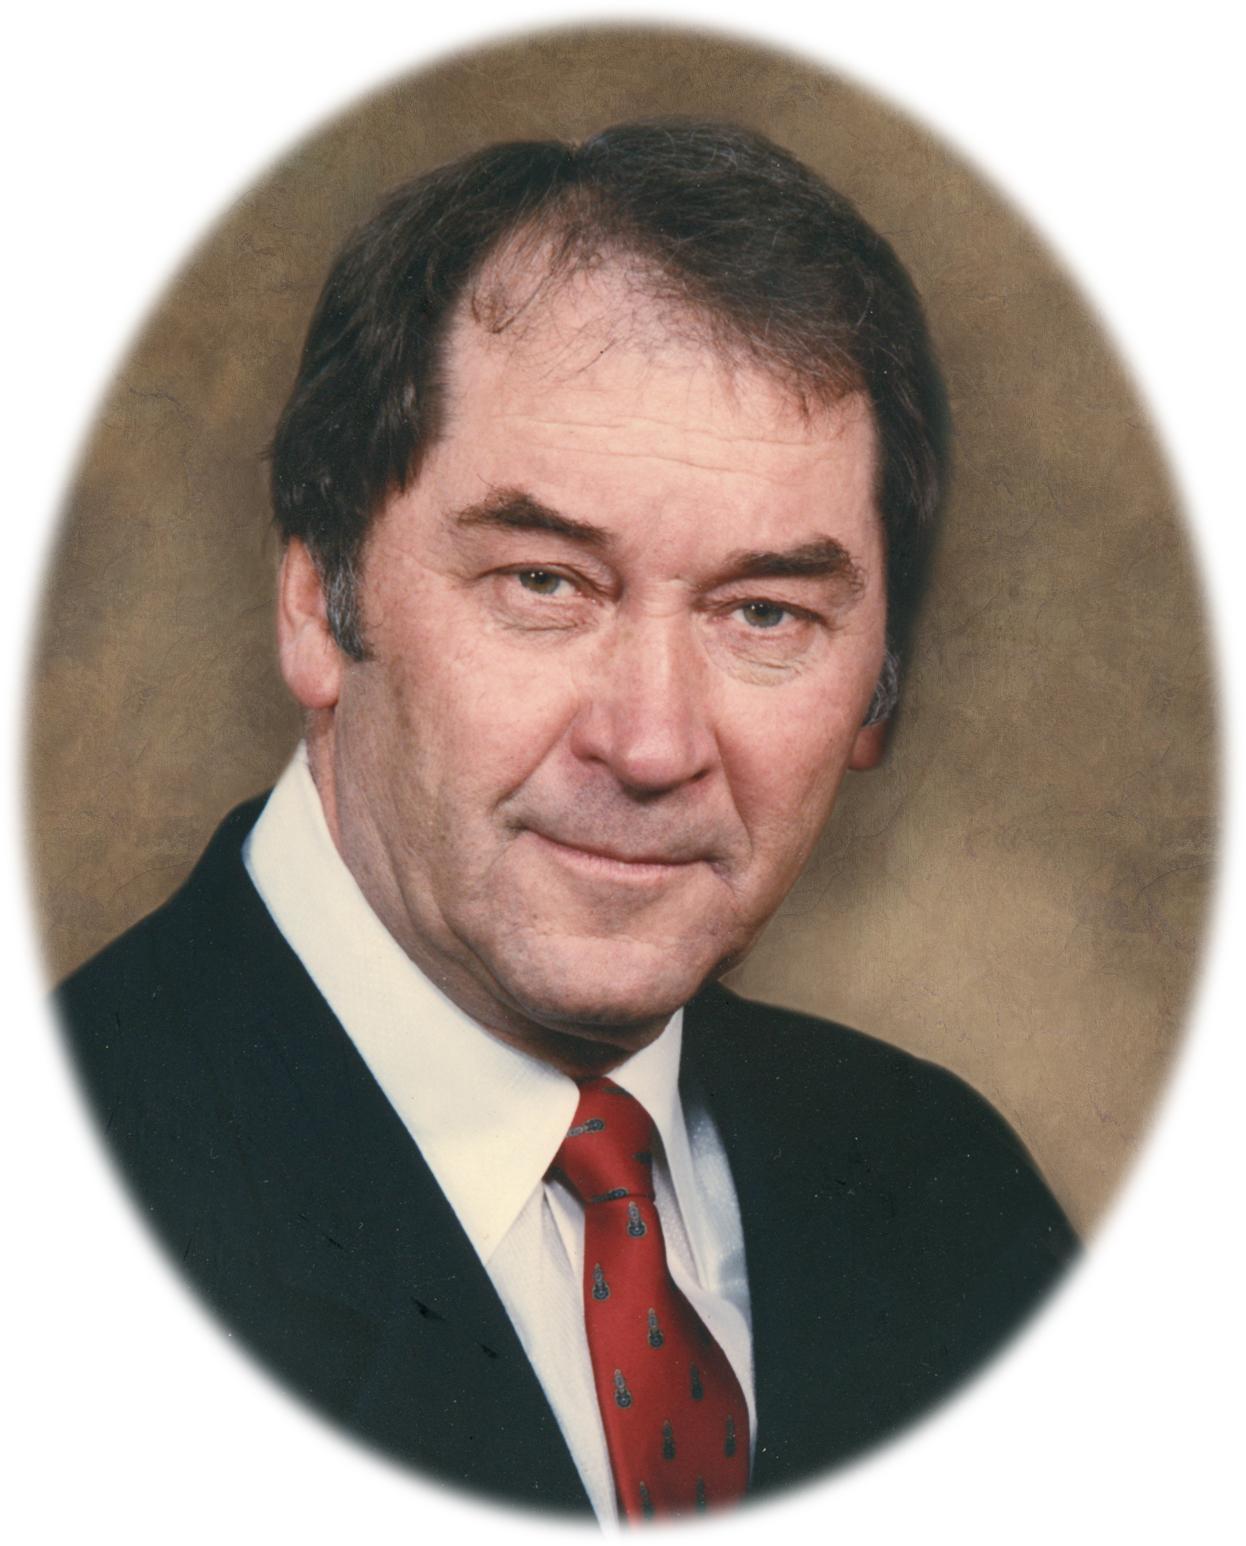 John E. Belsky